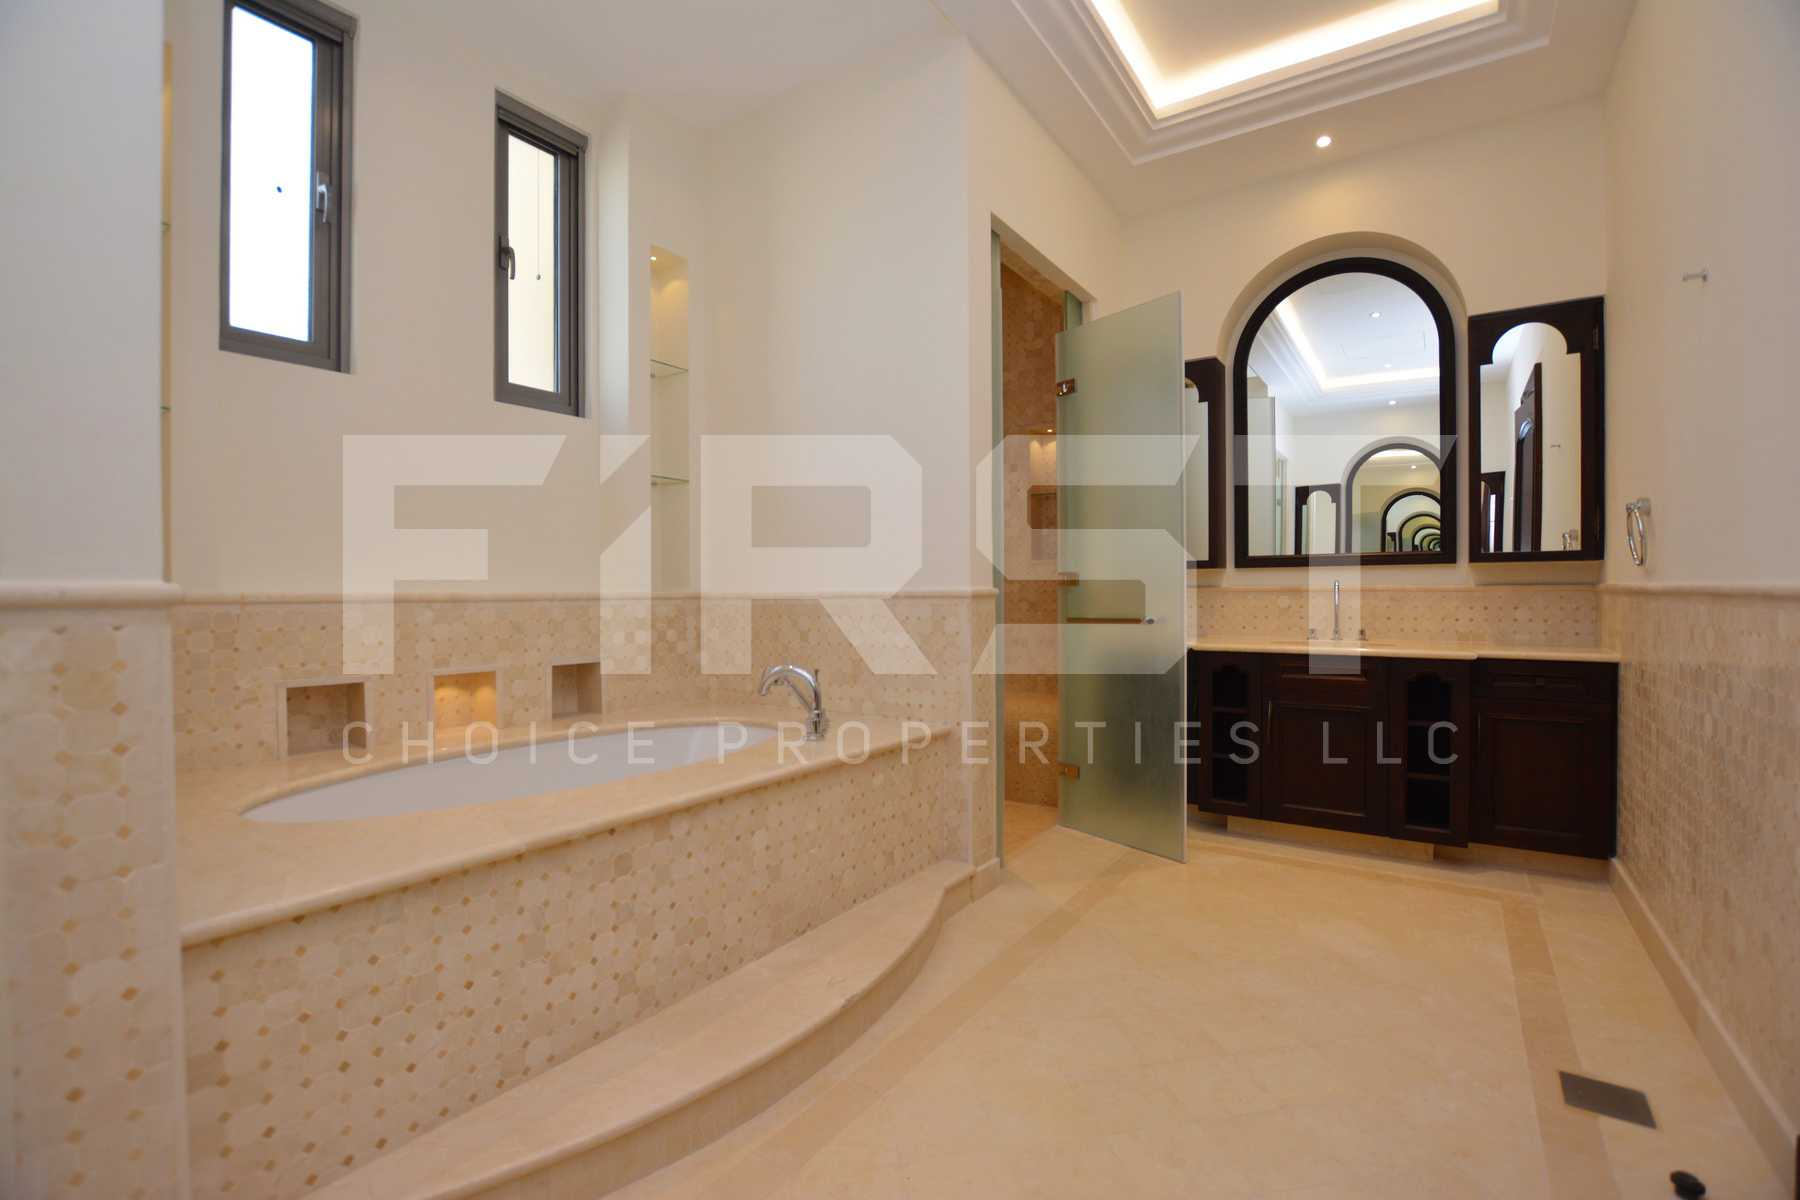 Internal Photo of Delux 5 Bedroom Villa in Saadiyat Beach Villas Saadiyat Island Abu Dhabi UAE (73).jpg